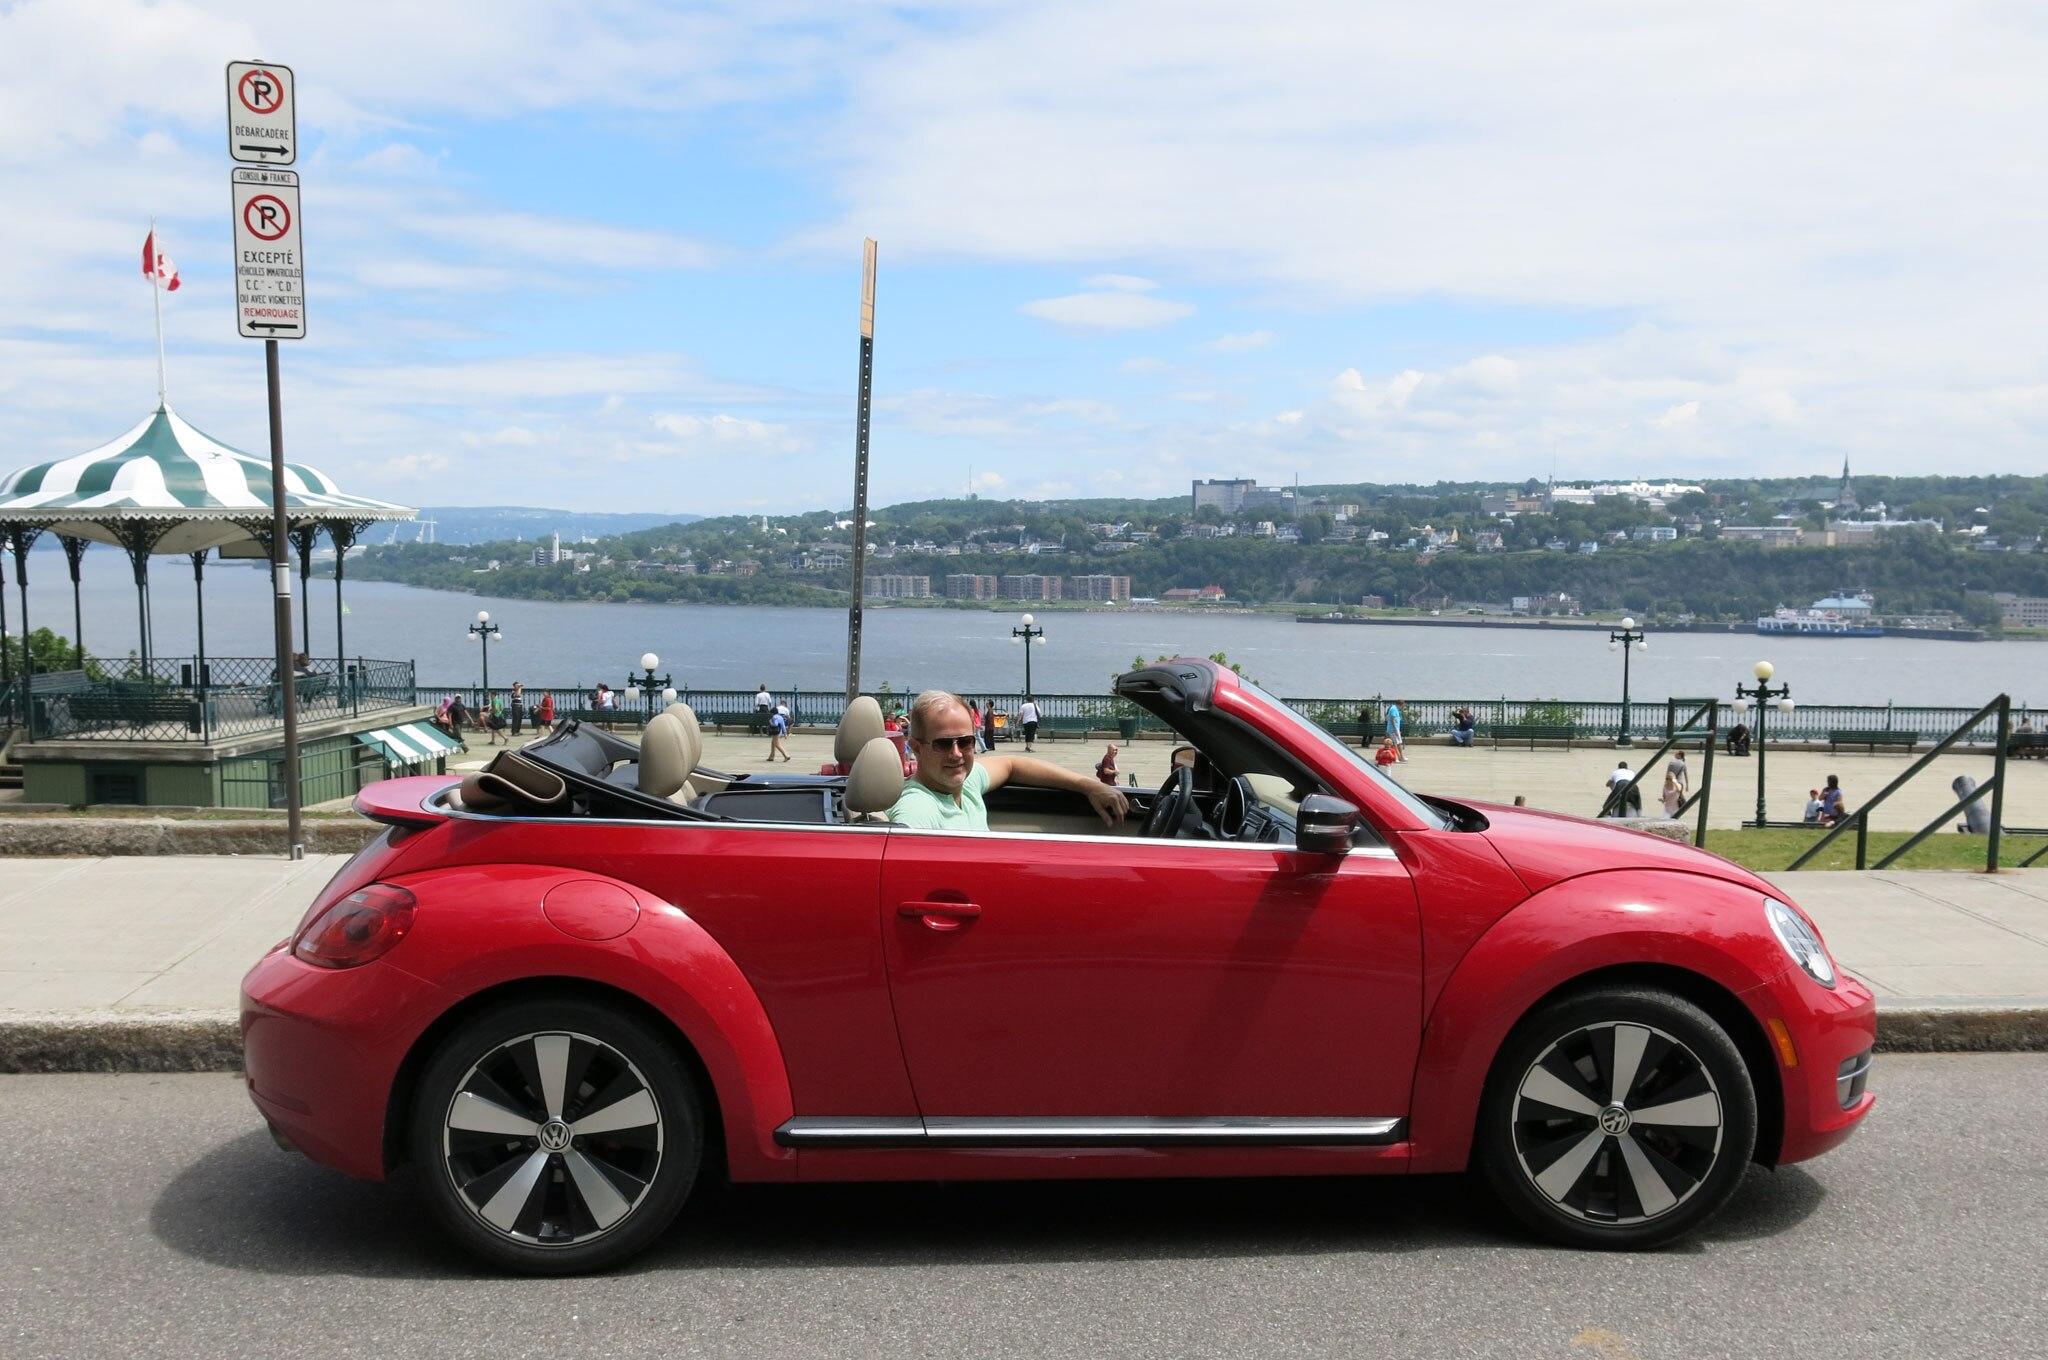 2013 Volkswagen Beetle Turbo Convertible Four Seasons